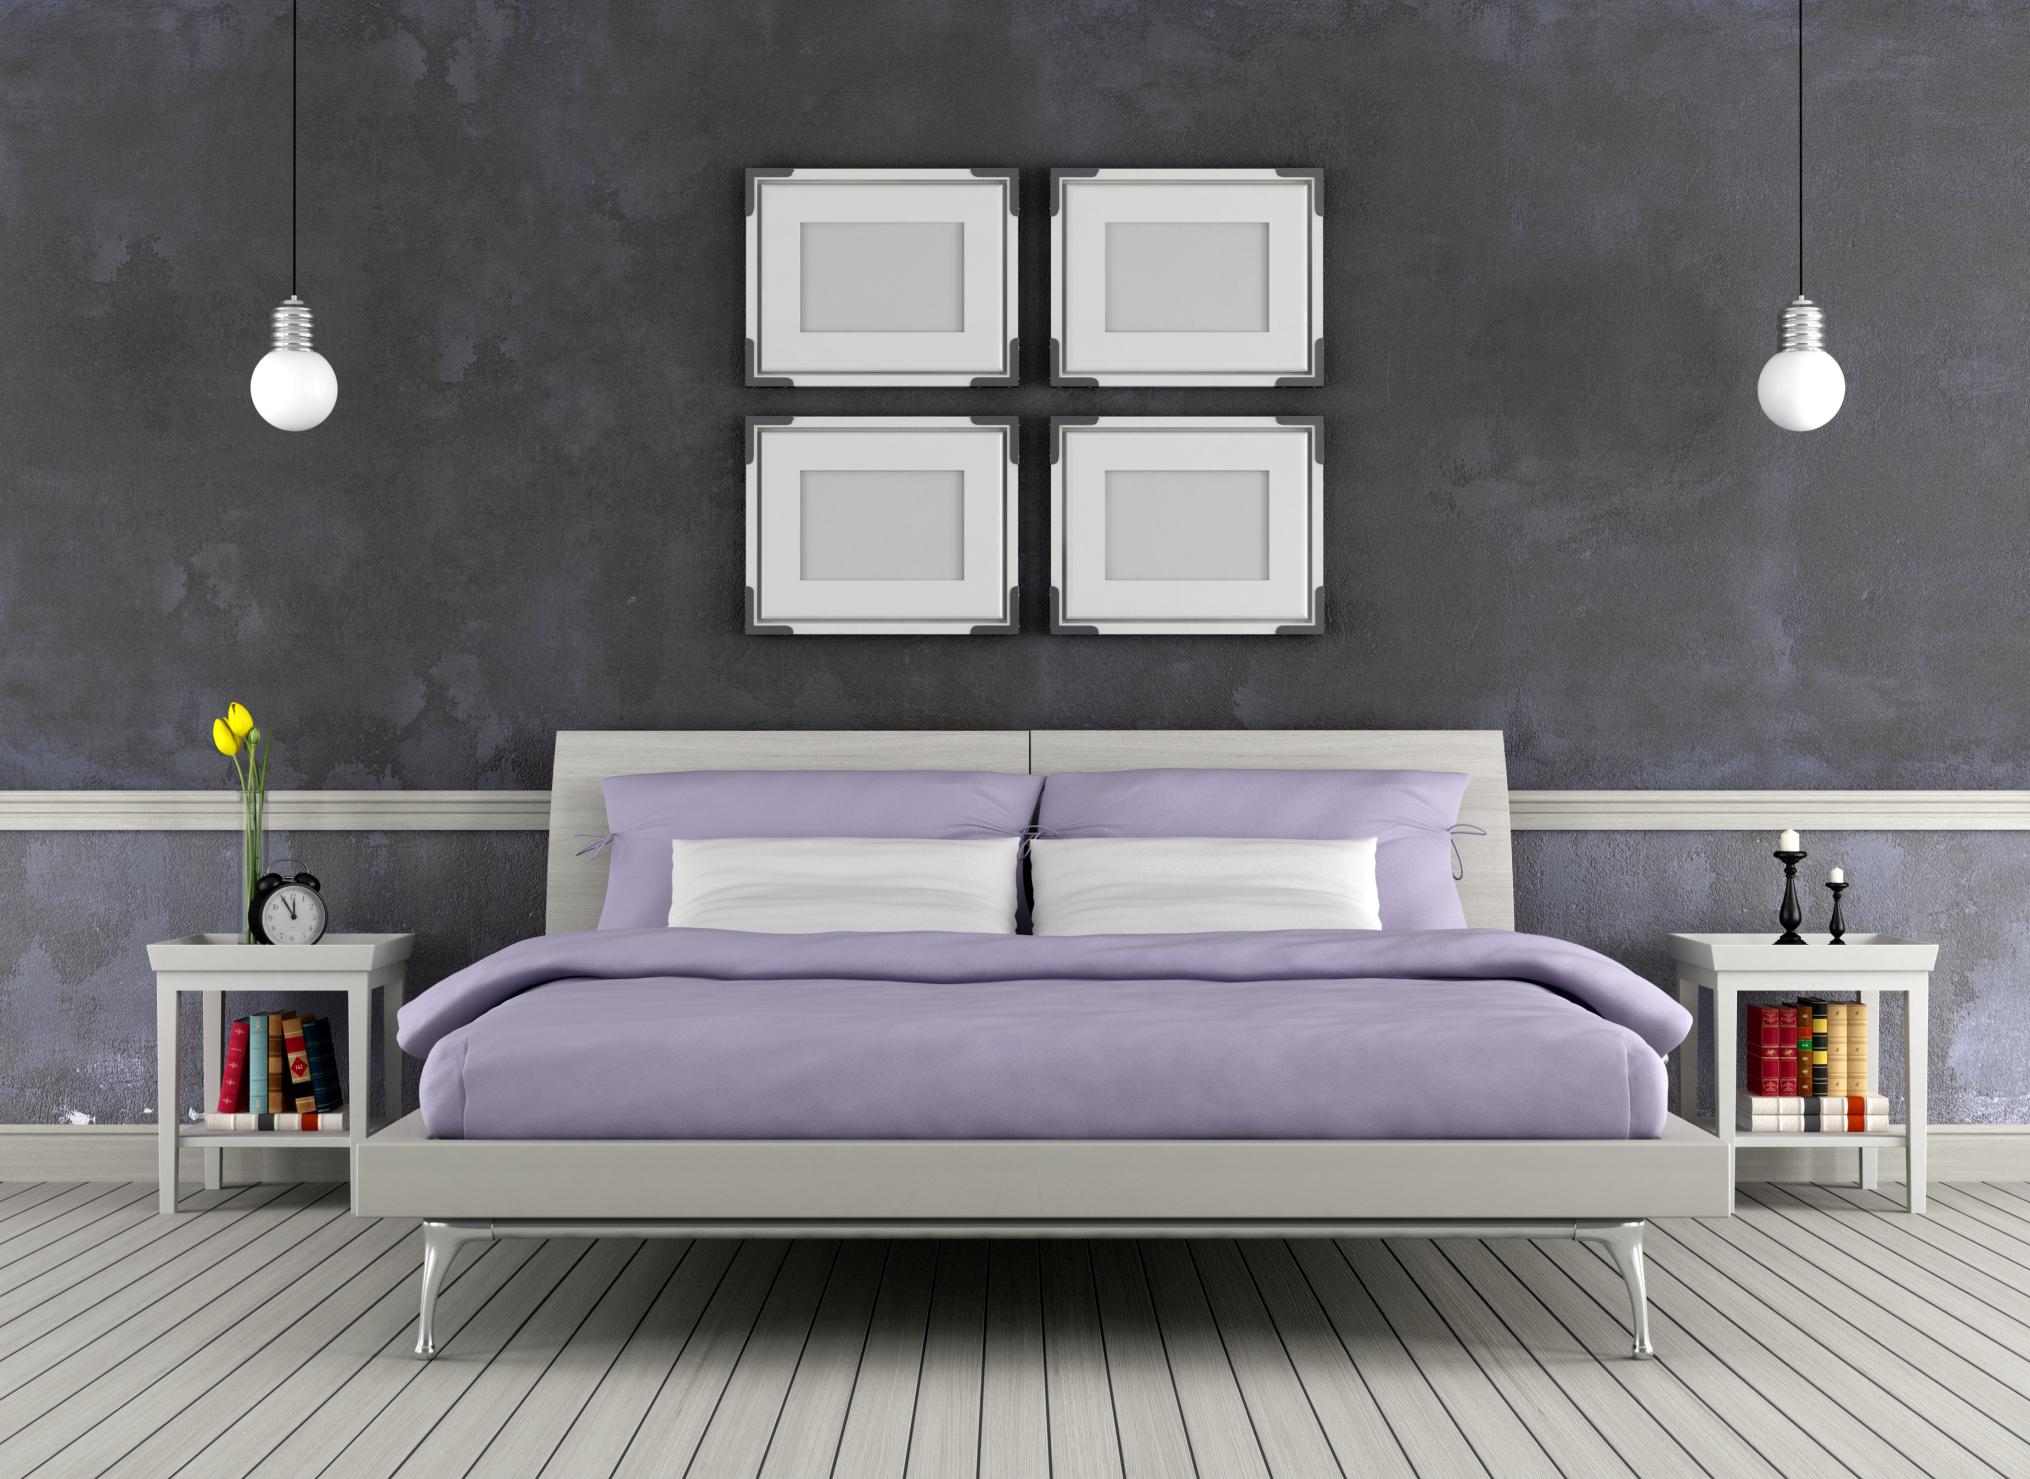 10 Secrets for Making Your Bedroom Feel Larger